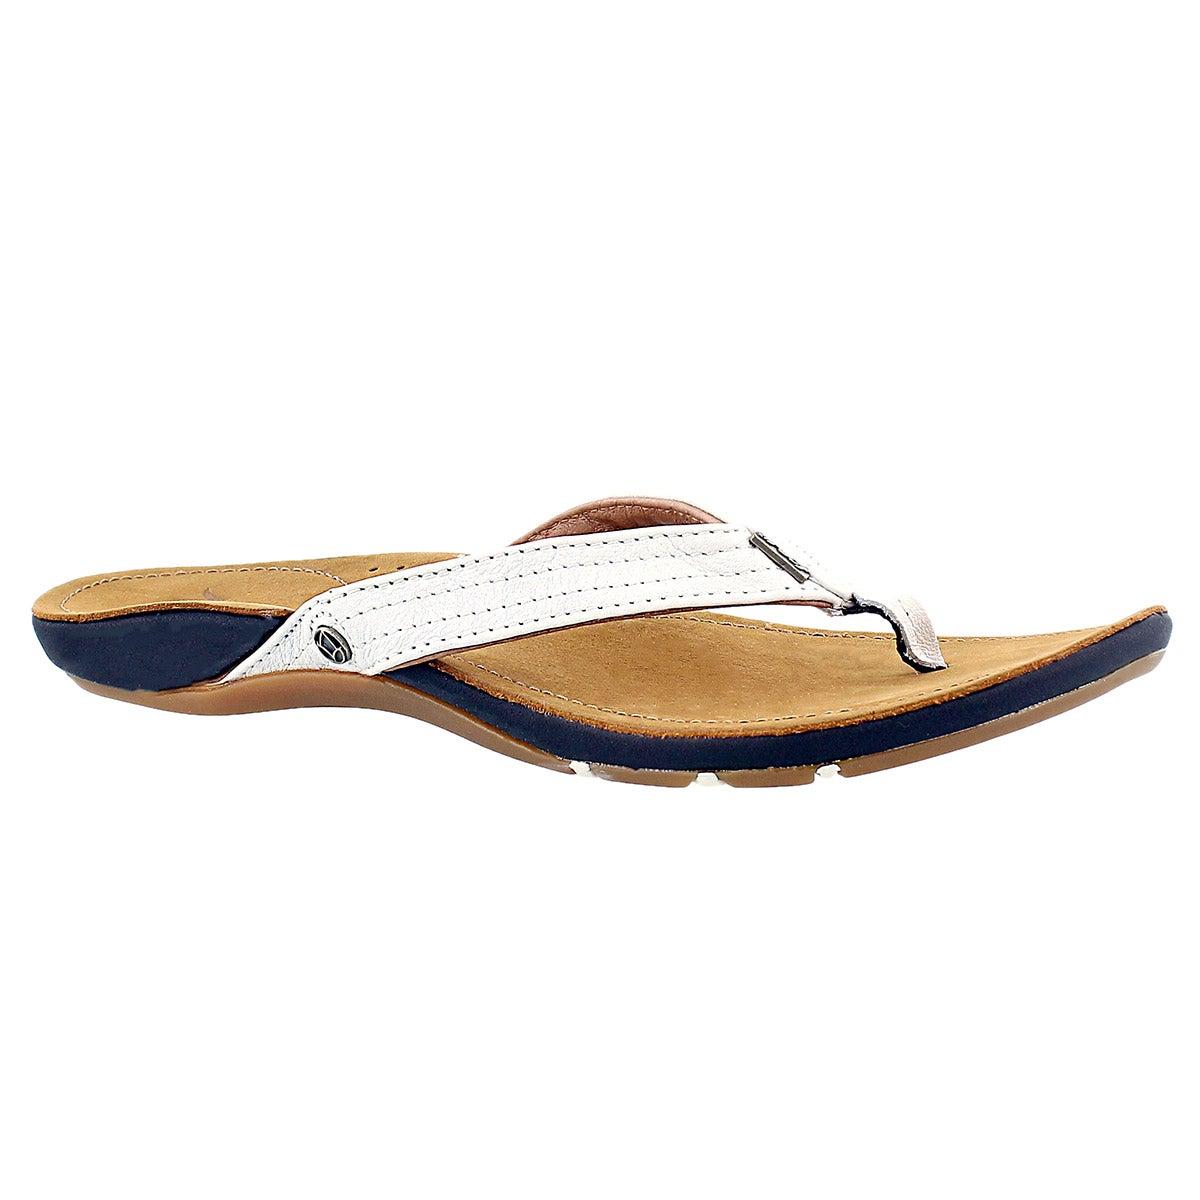 Women's MISS J BAY white sandals